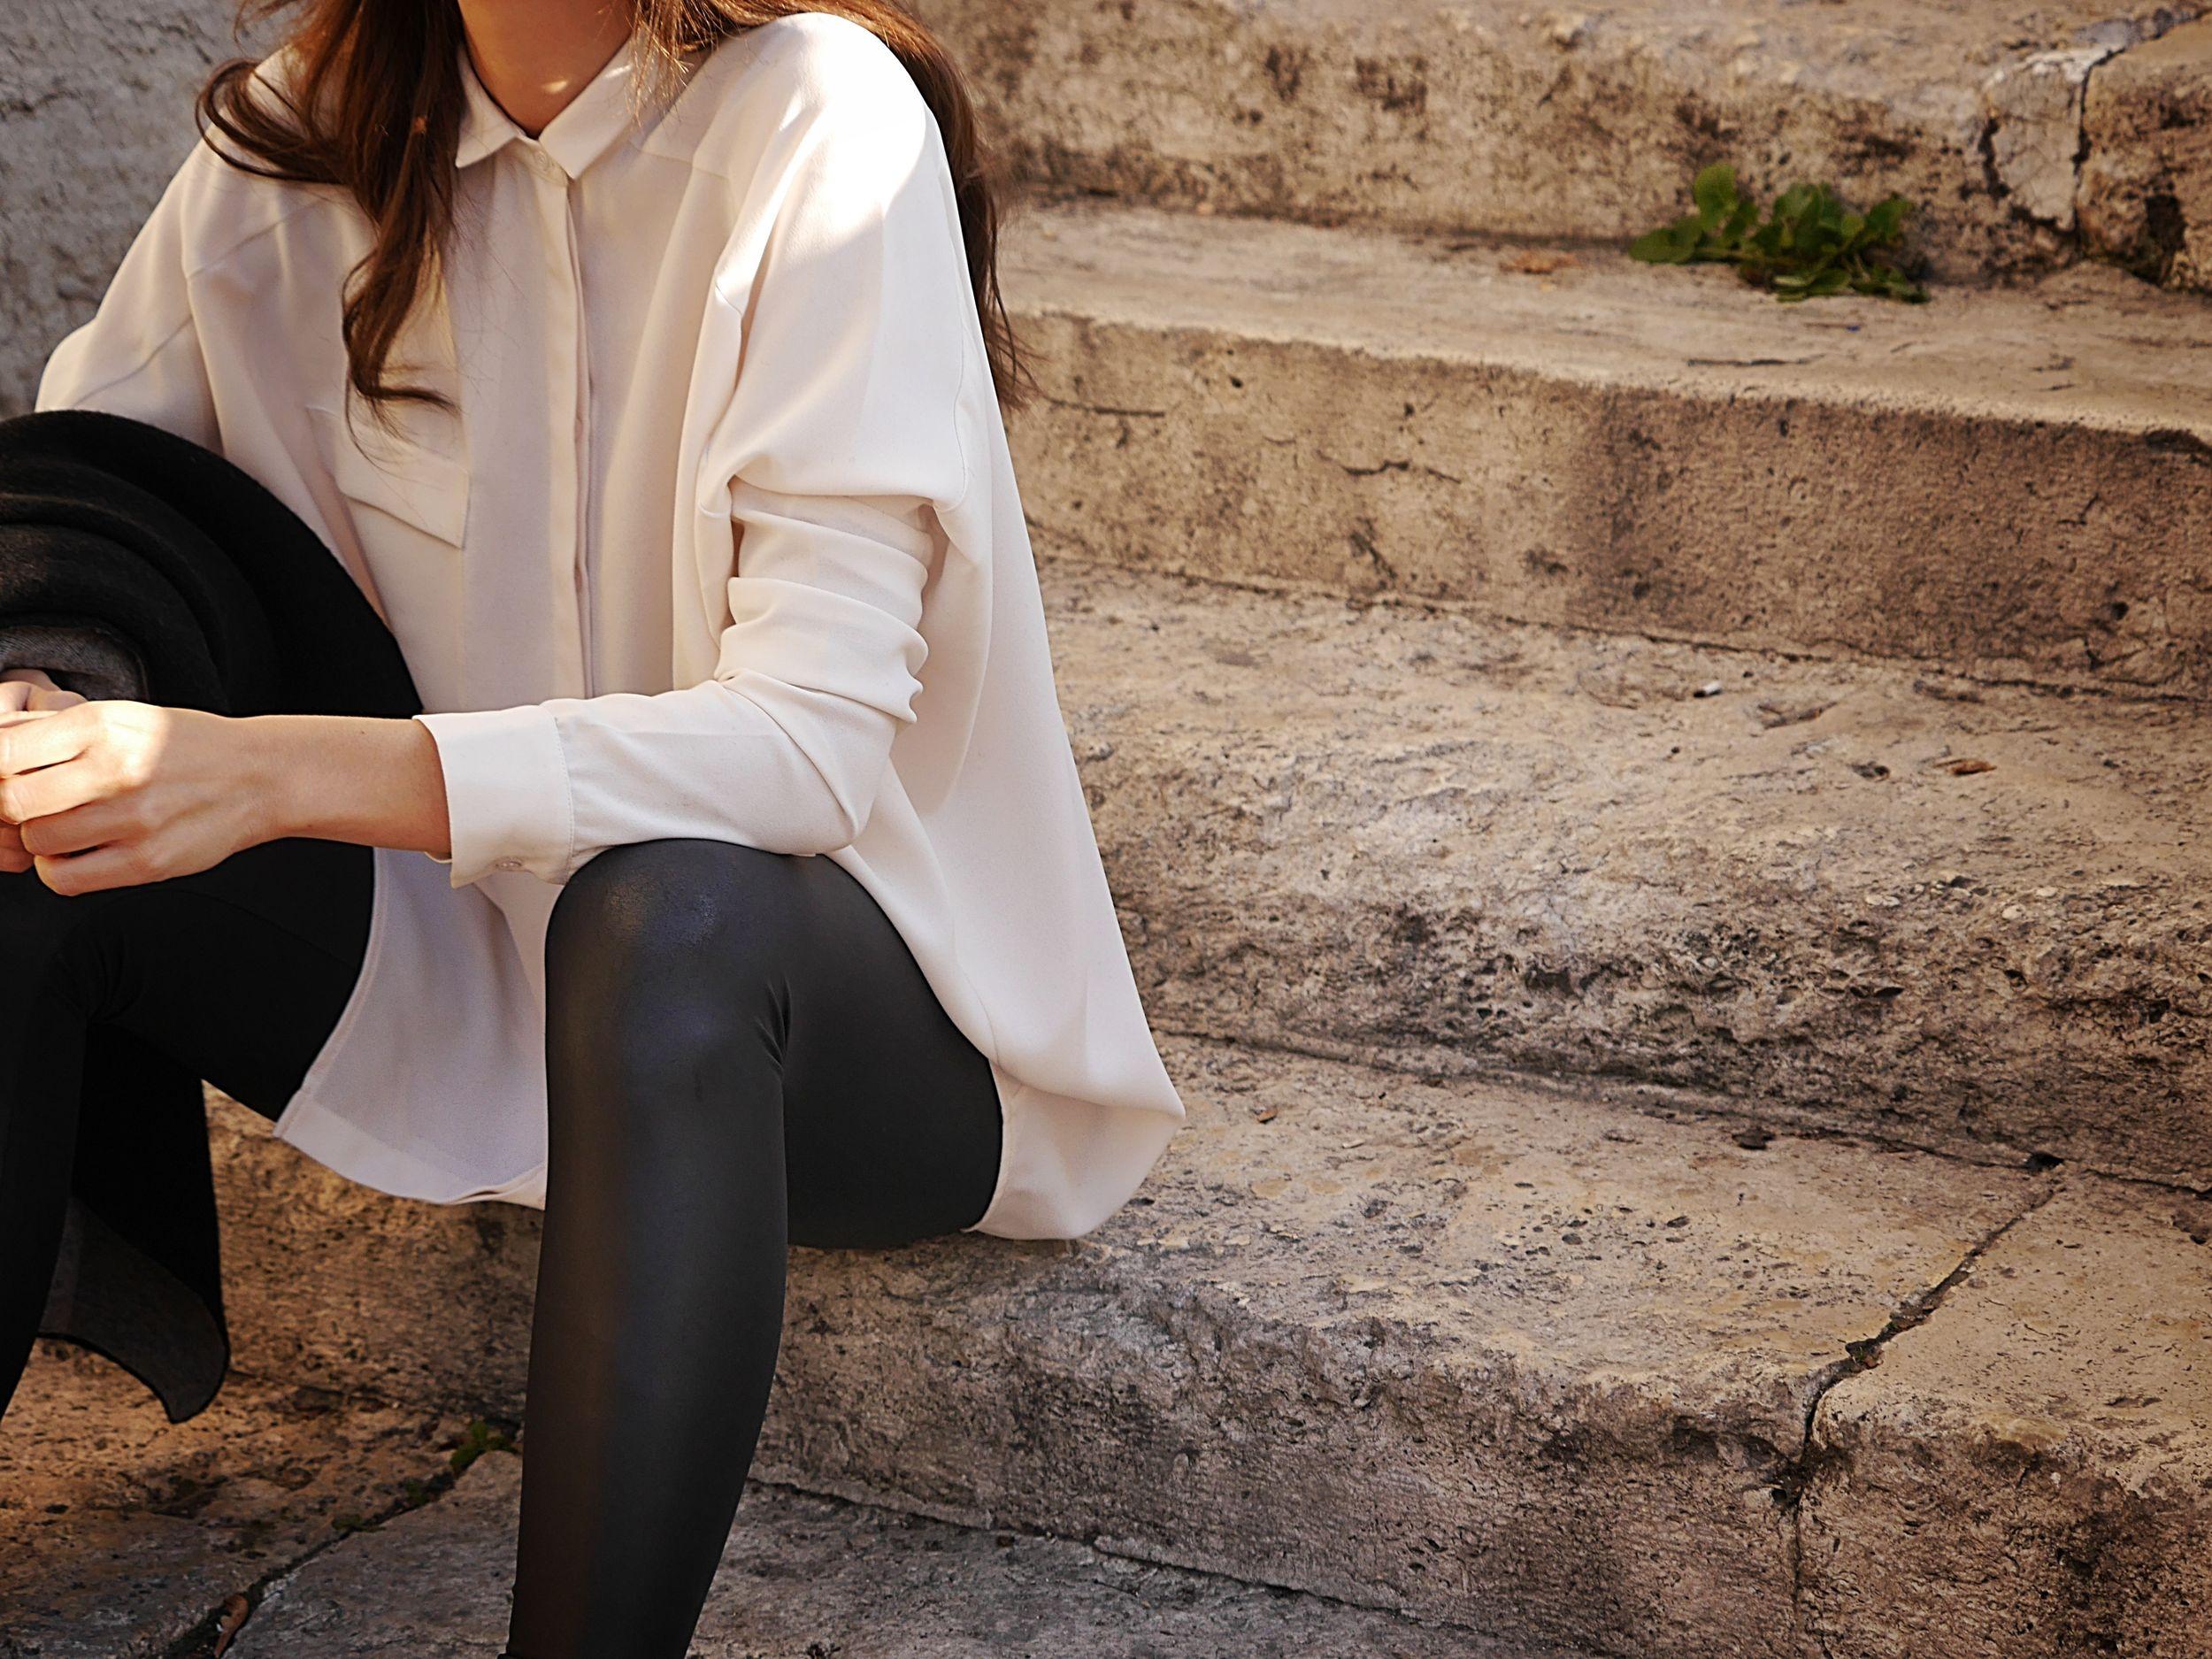 mija, american apparel, cos, alexander wang, outfit, street style, off ne giysem